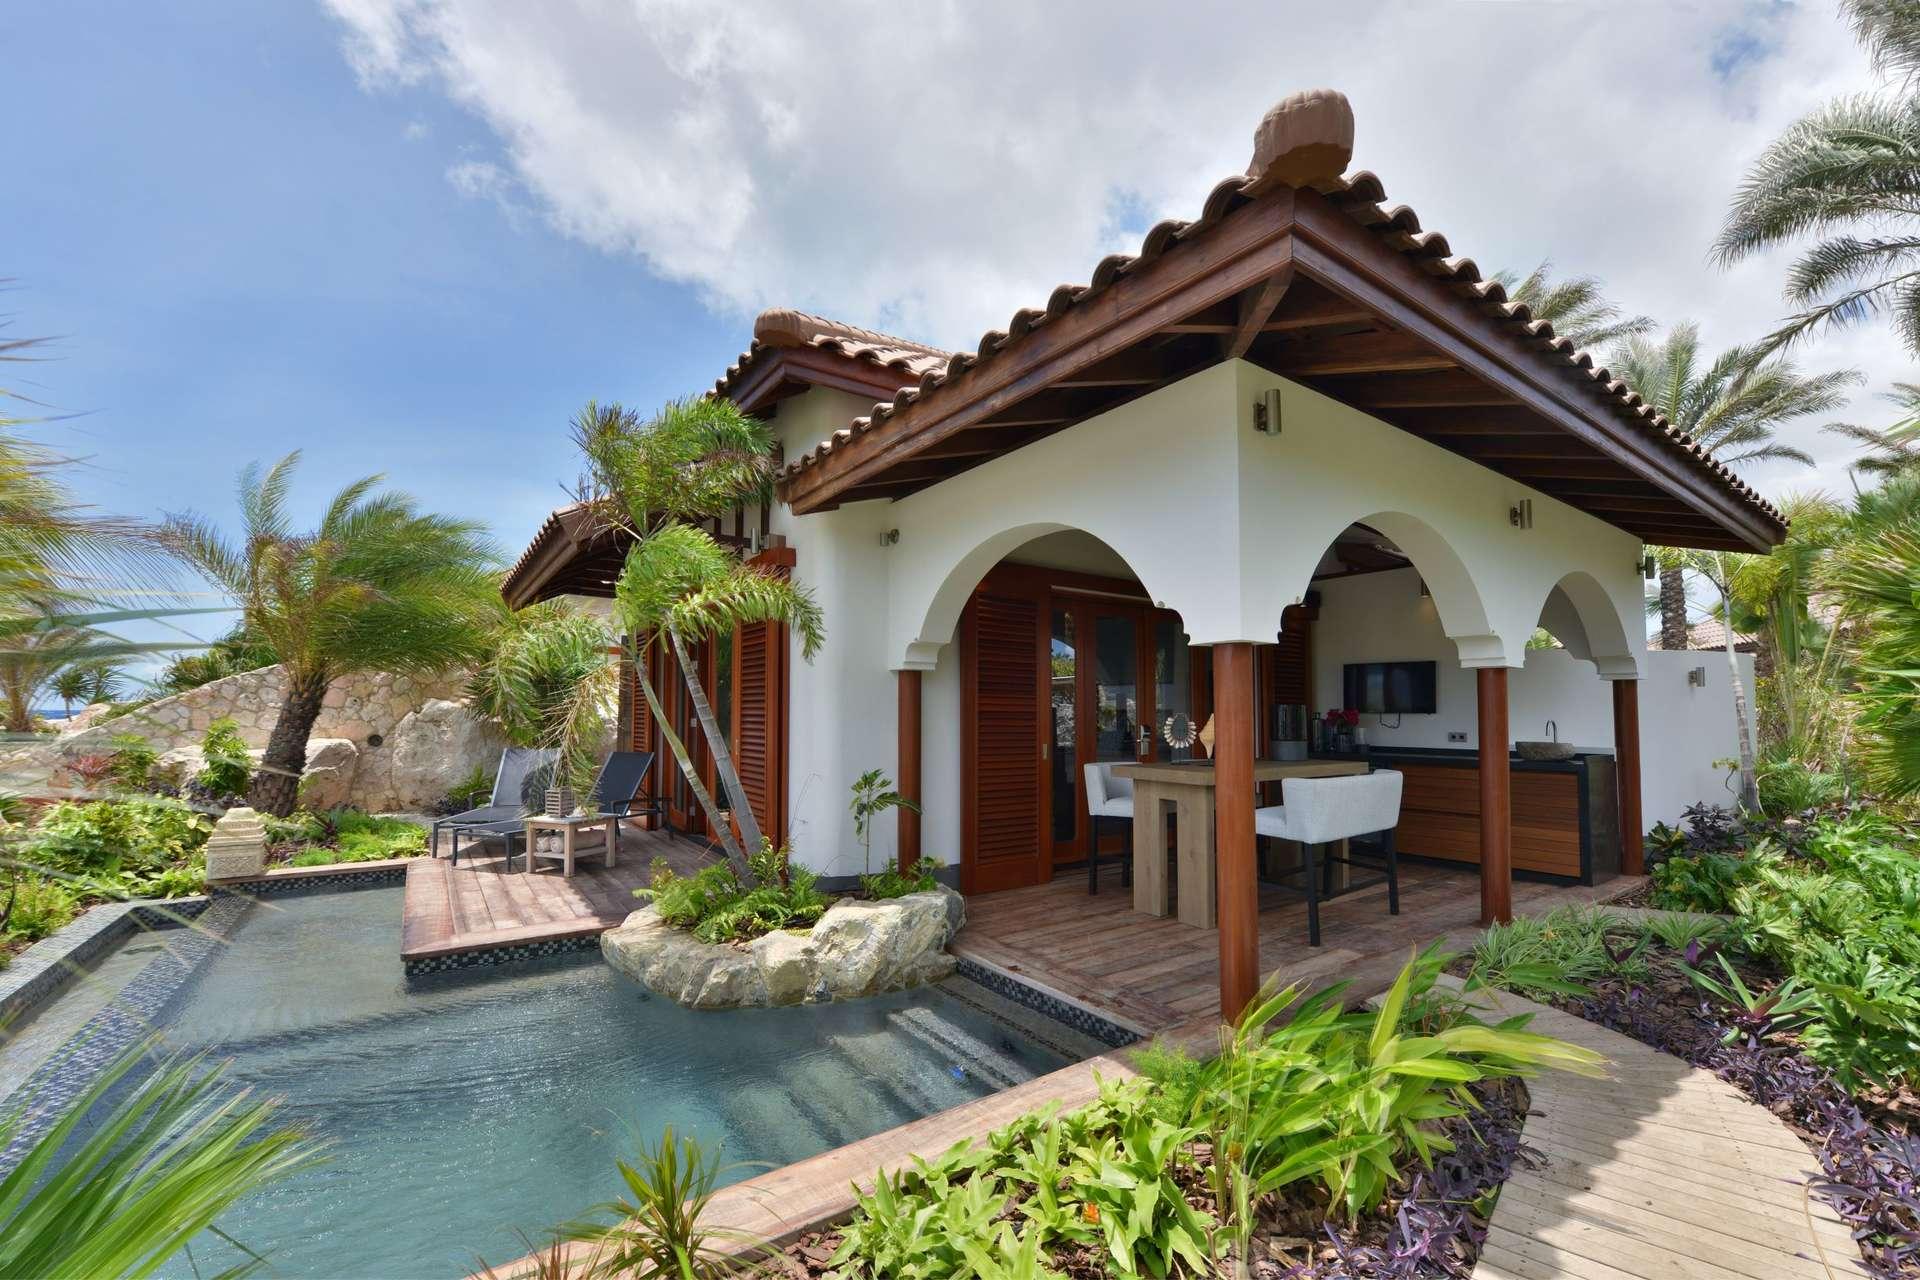 Luxury villa rentals caribbean - Curacao - Baoase luxury resort - No location 4 - Beachfront Pool Suite - Image 1/10